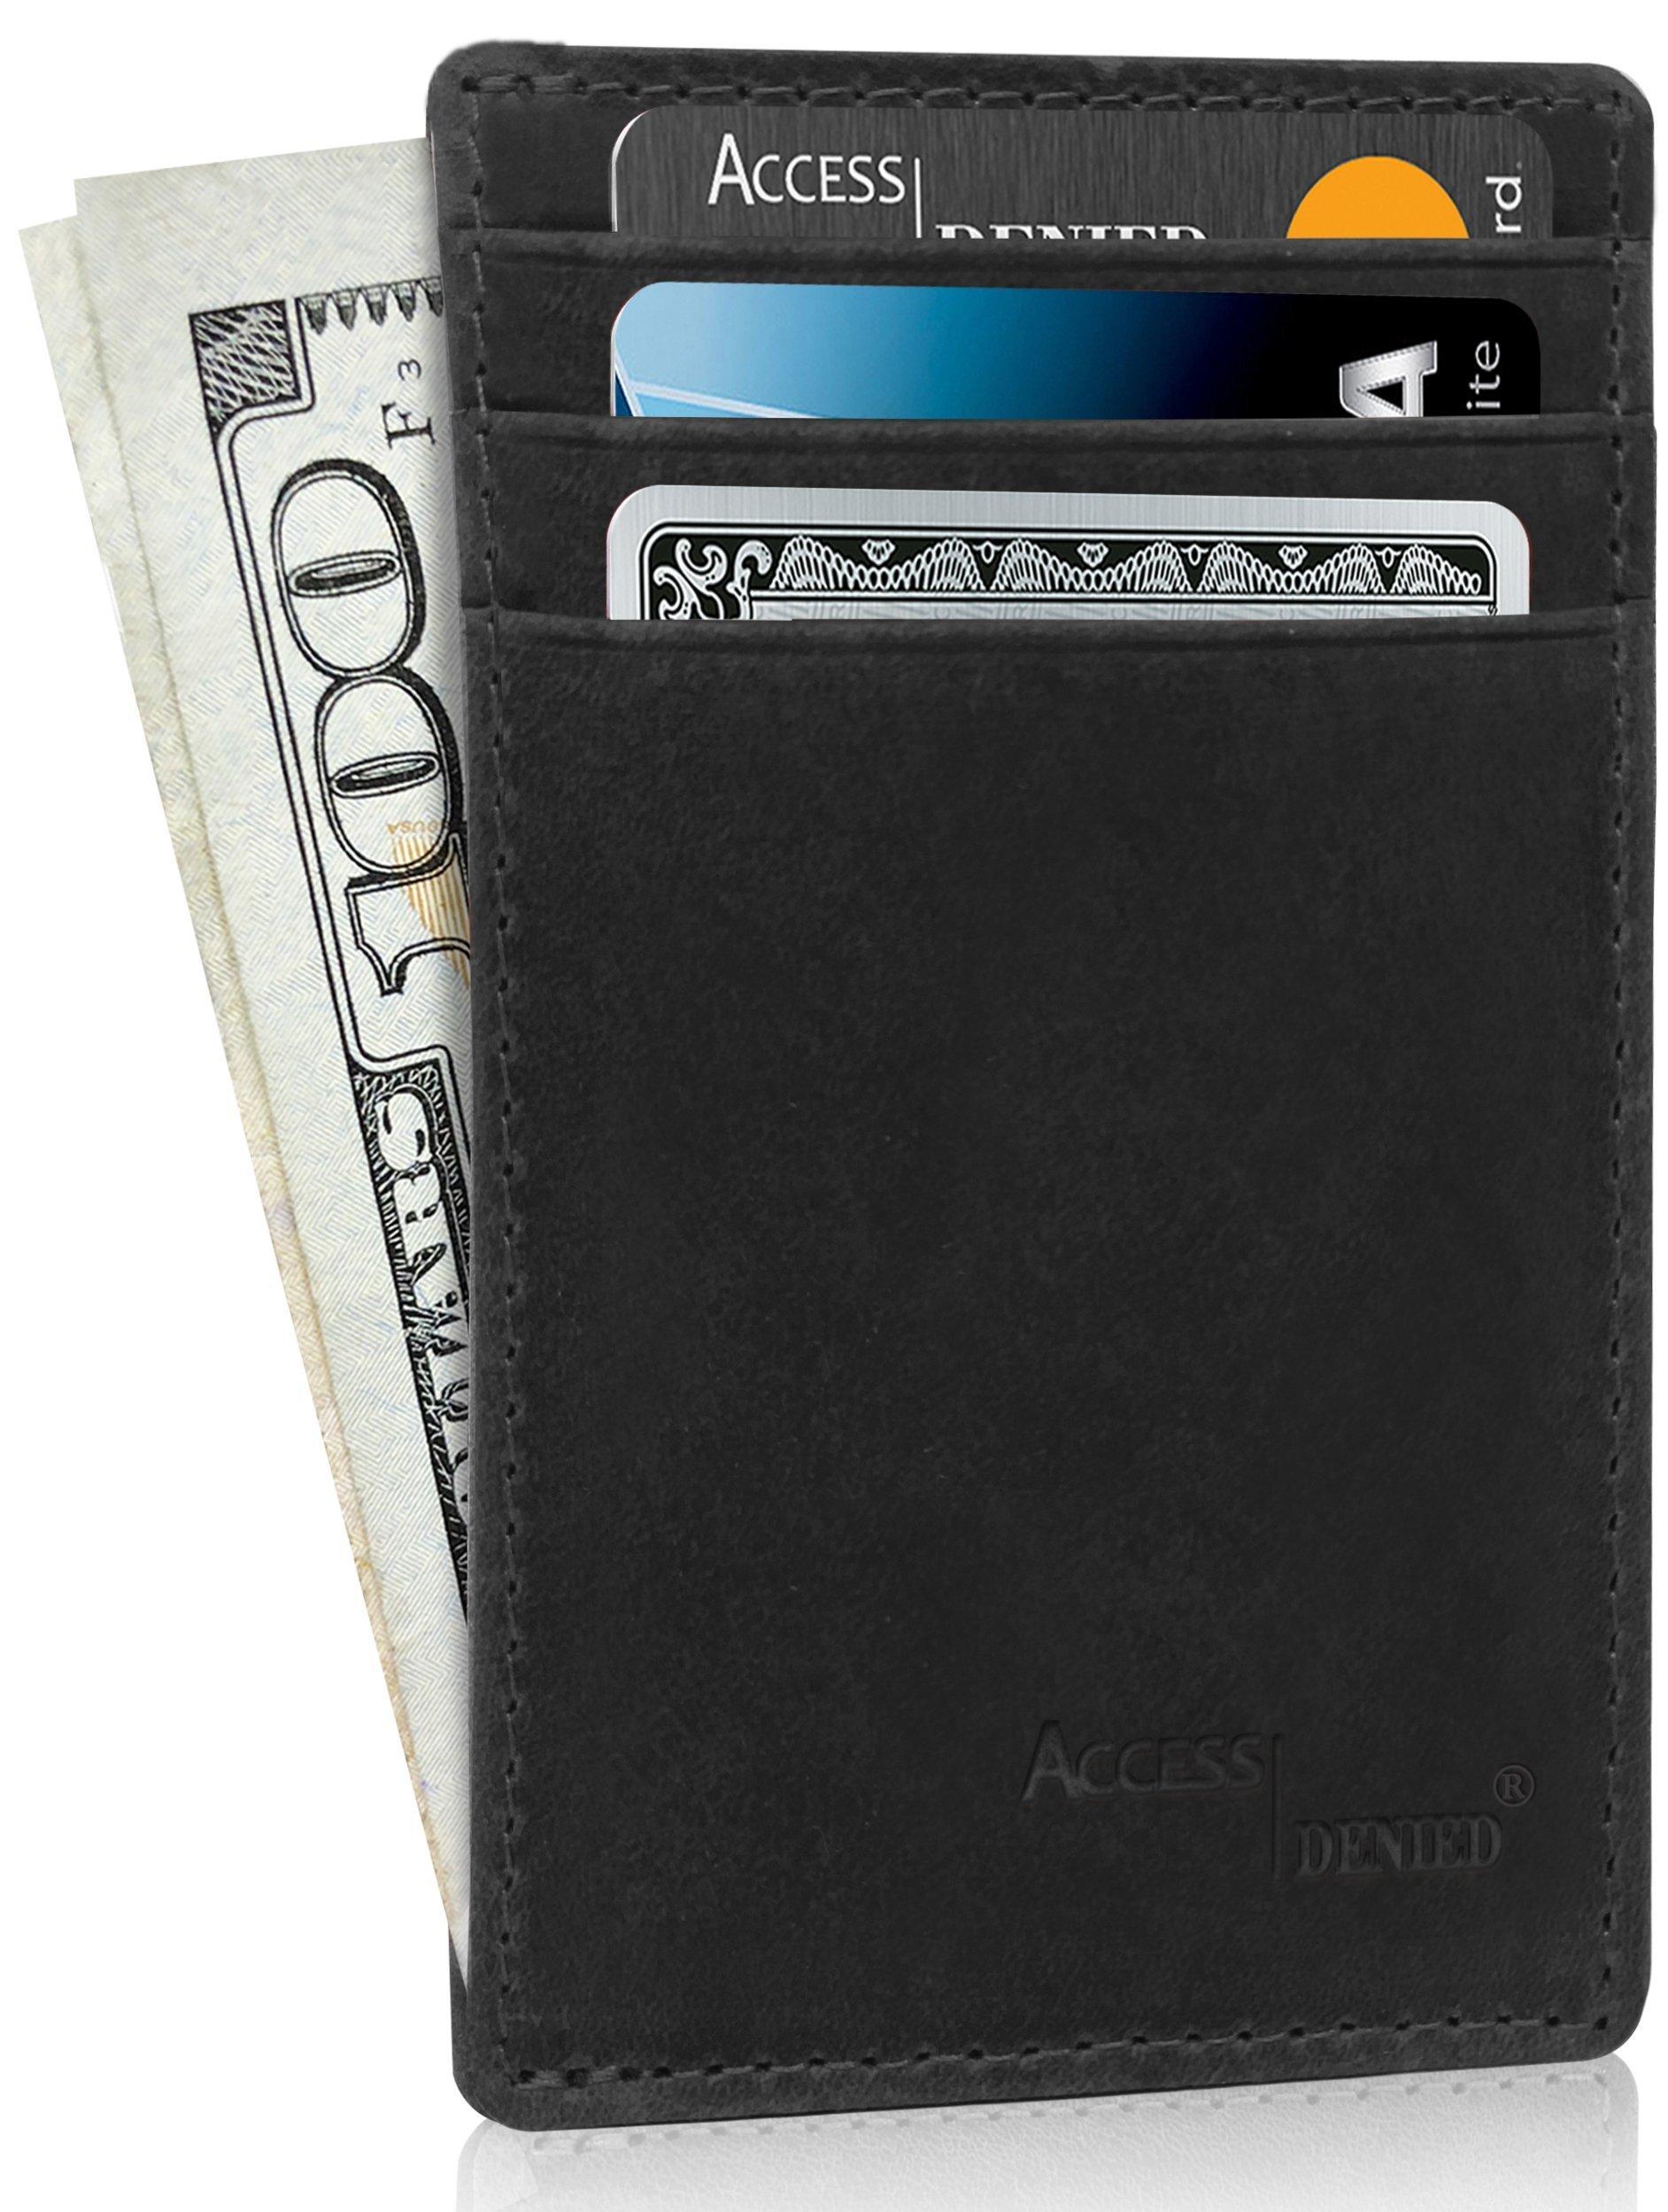 Slim Minimalist Wallets For Men - Small Leather Credit Card Holder RFID Blocking